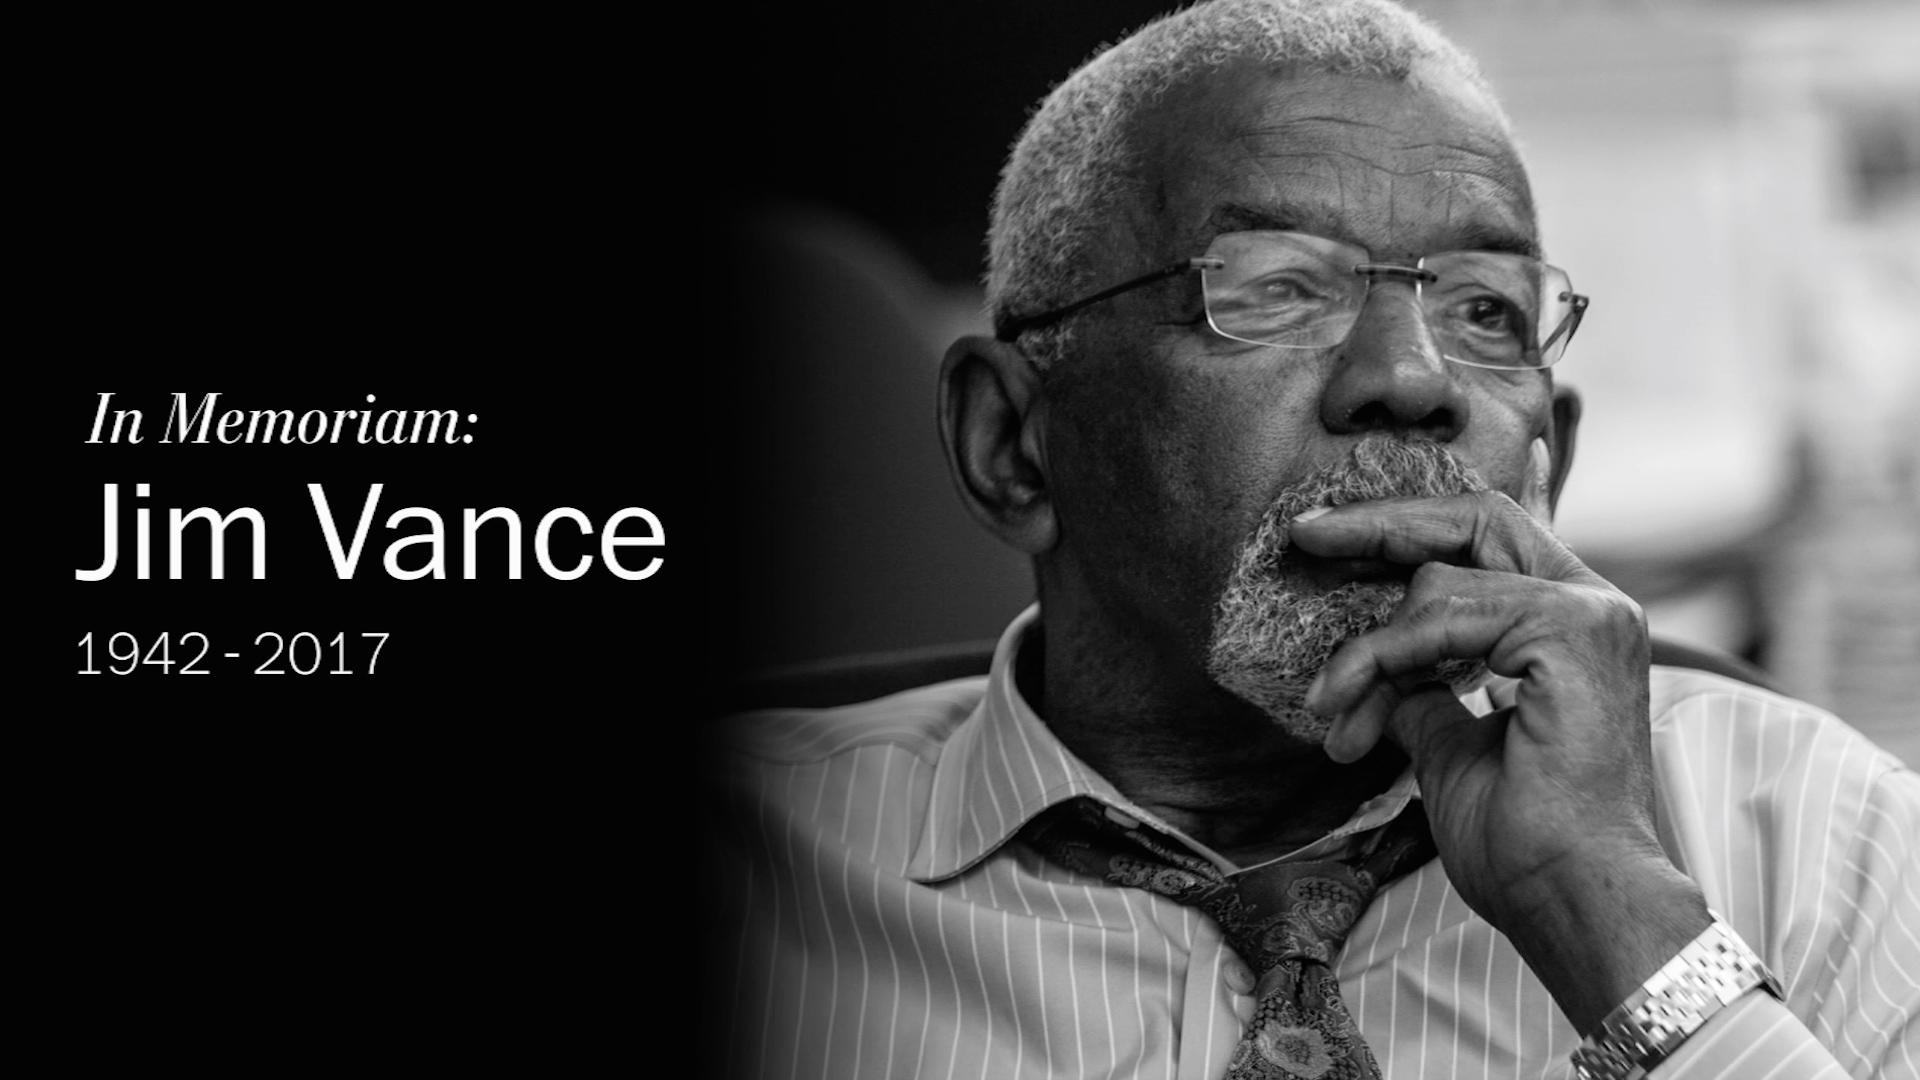 Remembering Jim Vance, D C 's longest-serving local news anchor